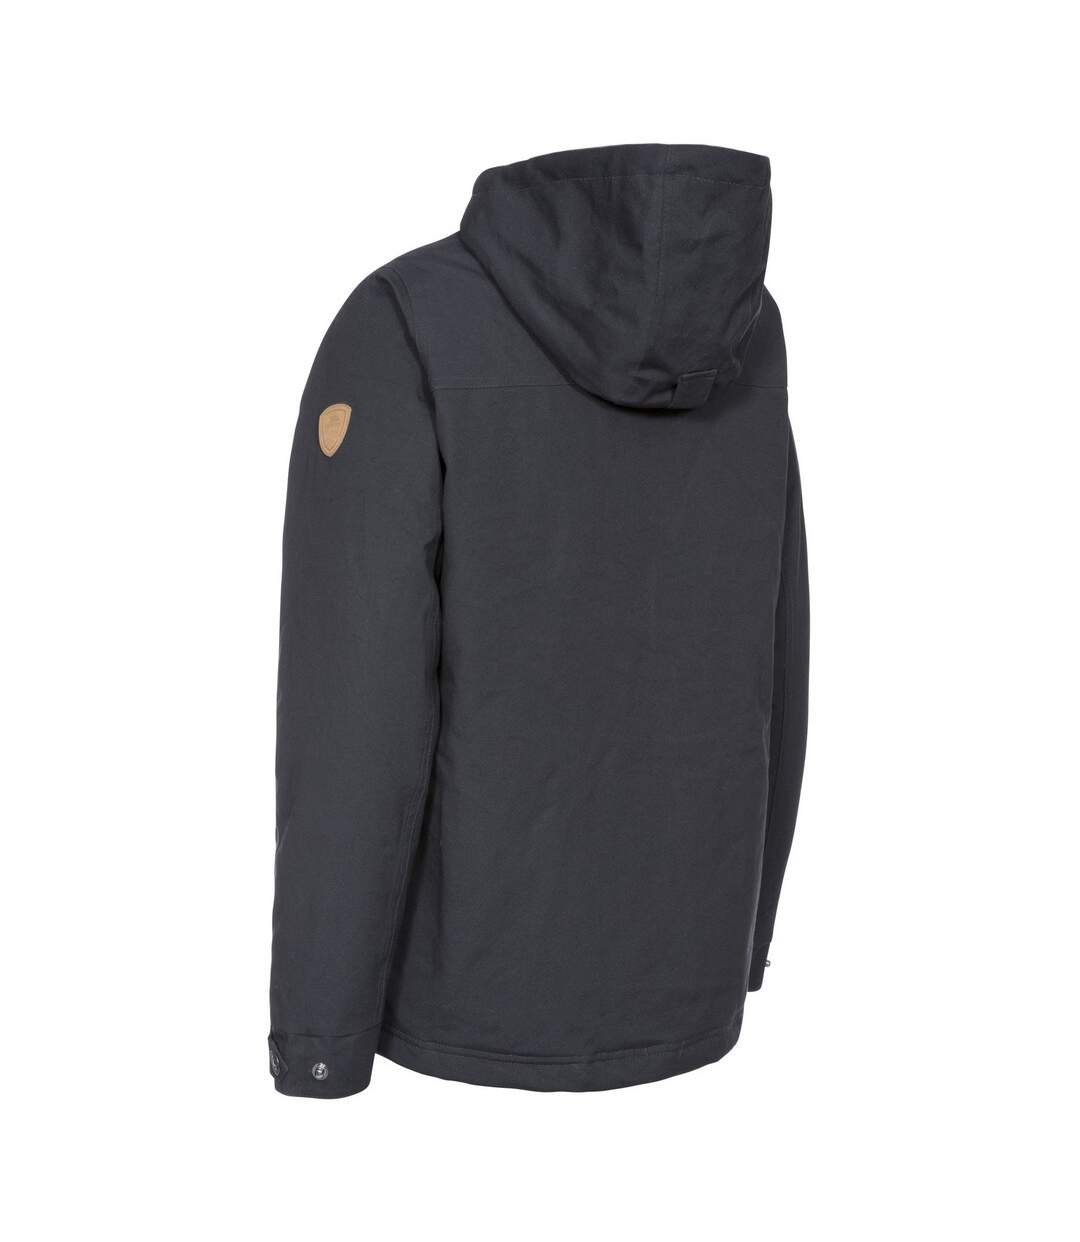 Trespass Womens/Ladies Devoted Waterproof Jacket (Dark Grey) - UTTP4817